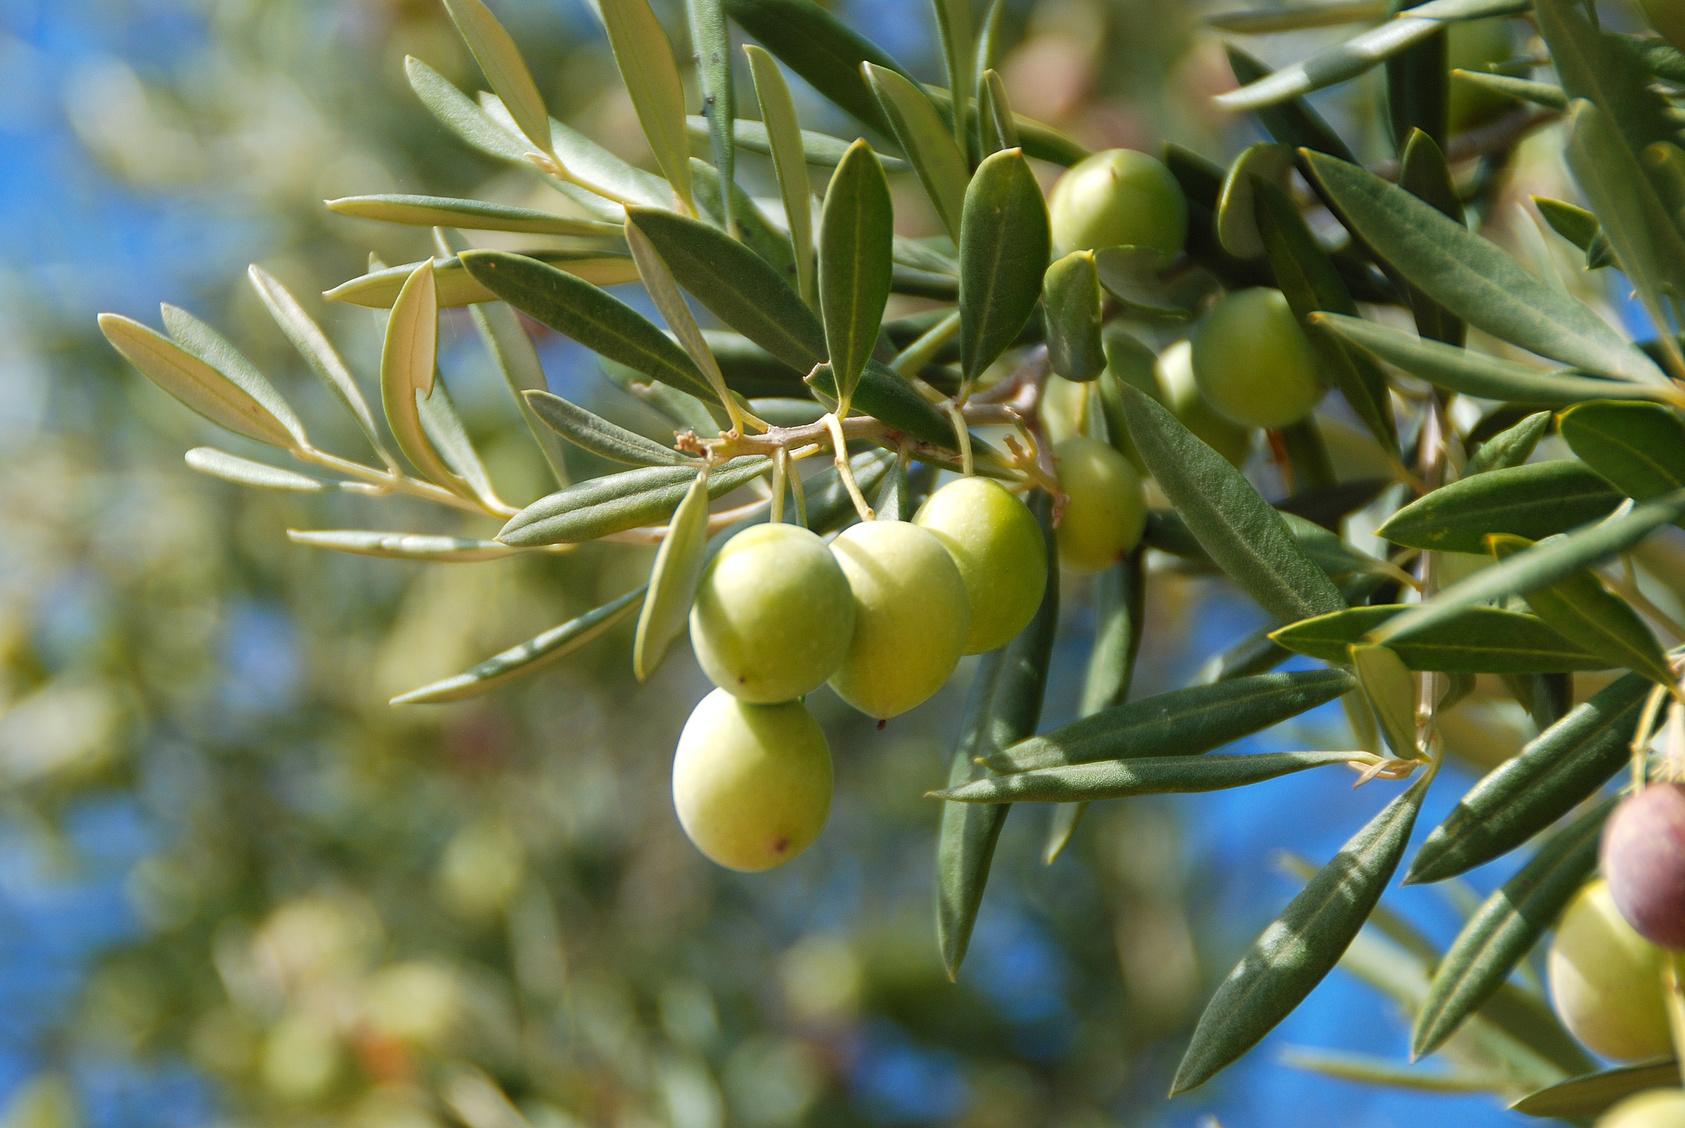 olive leaf immune defenses